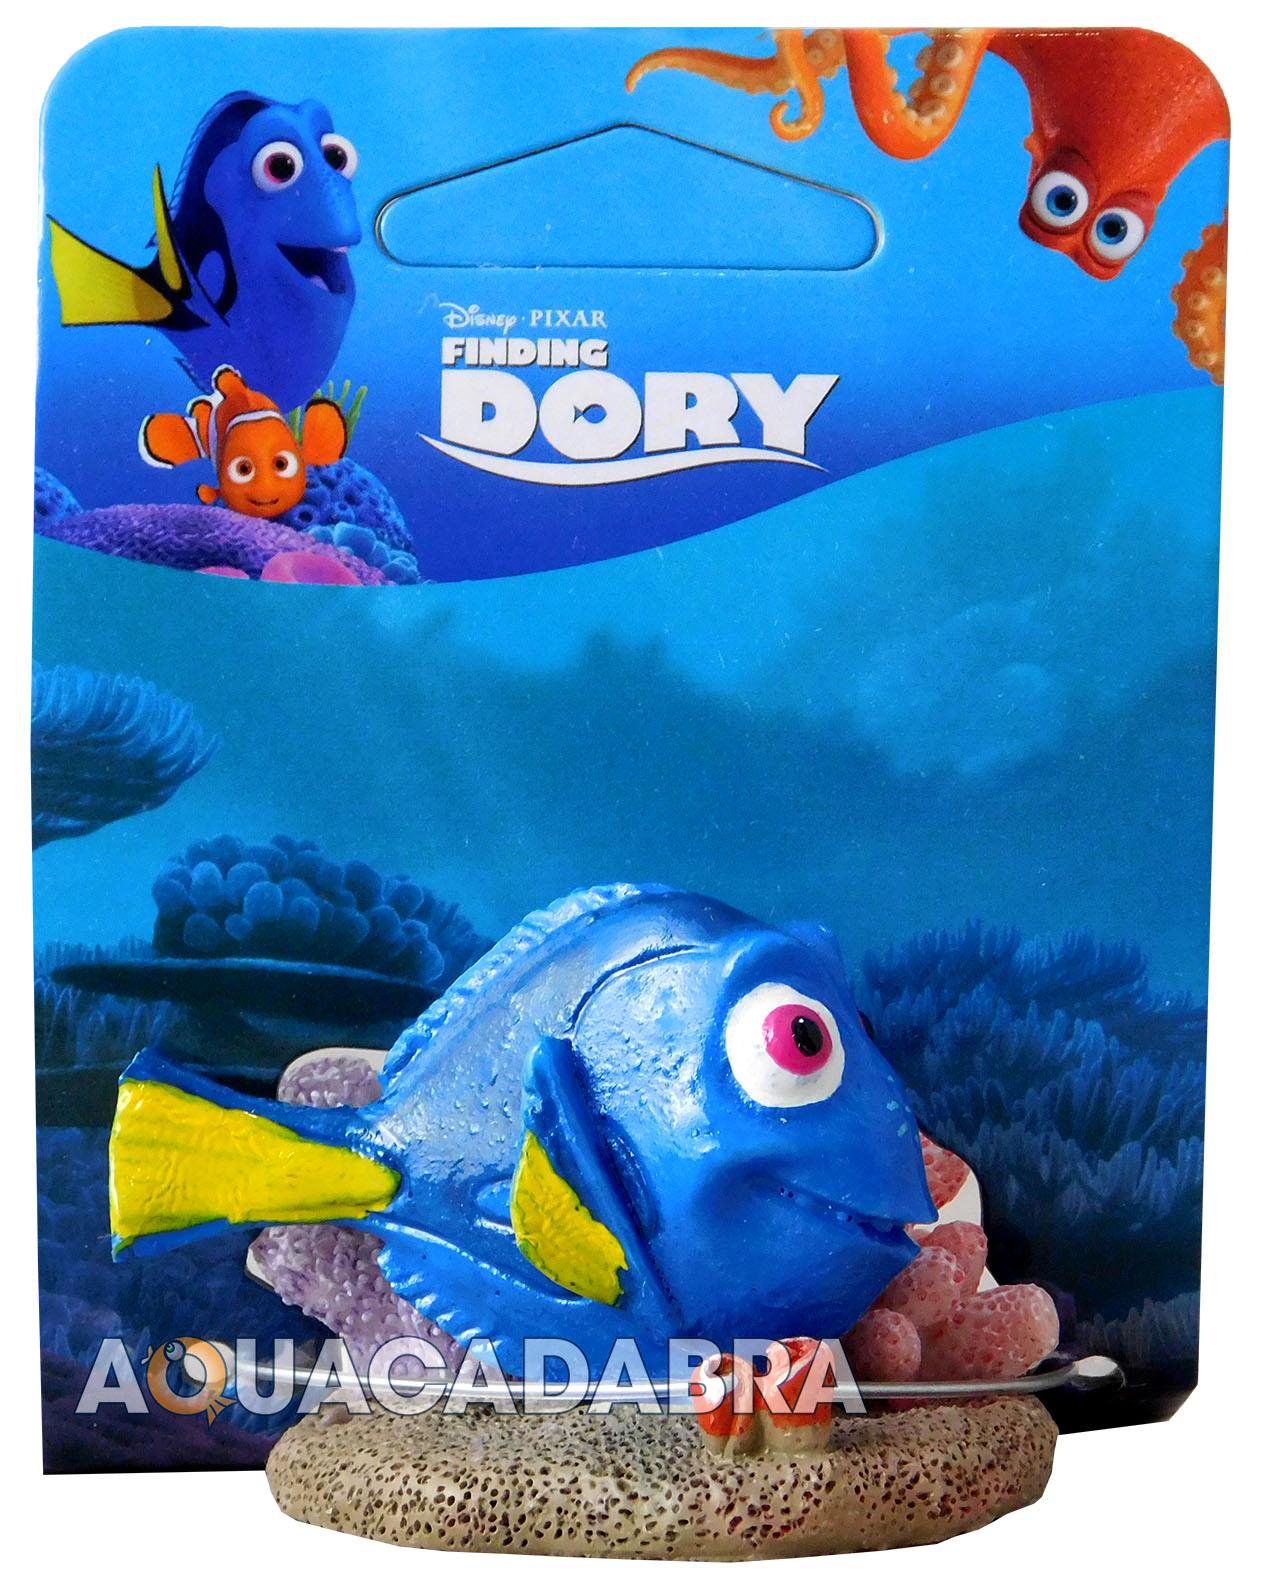 Finding dory aquarium ornaments marlin nemo disney pixar for Finding dory fish tank